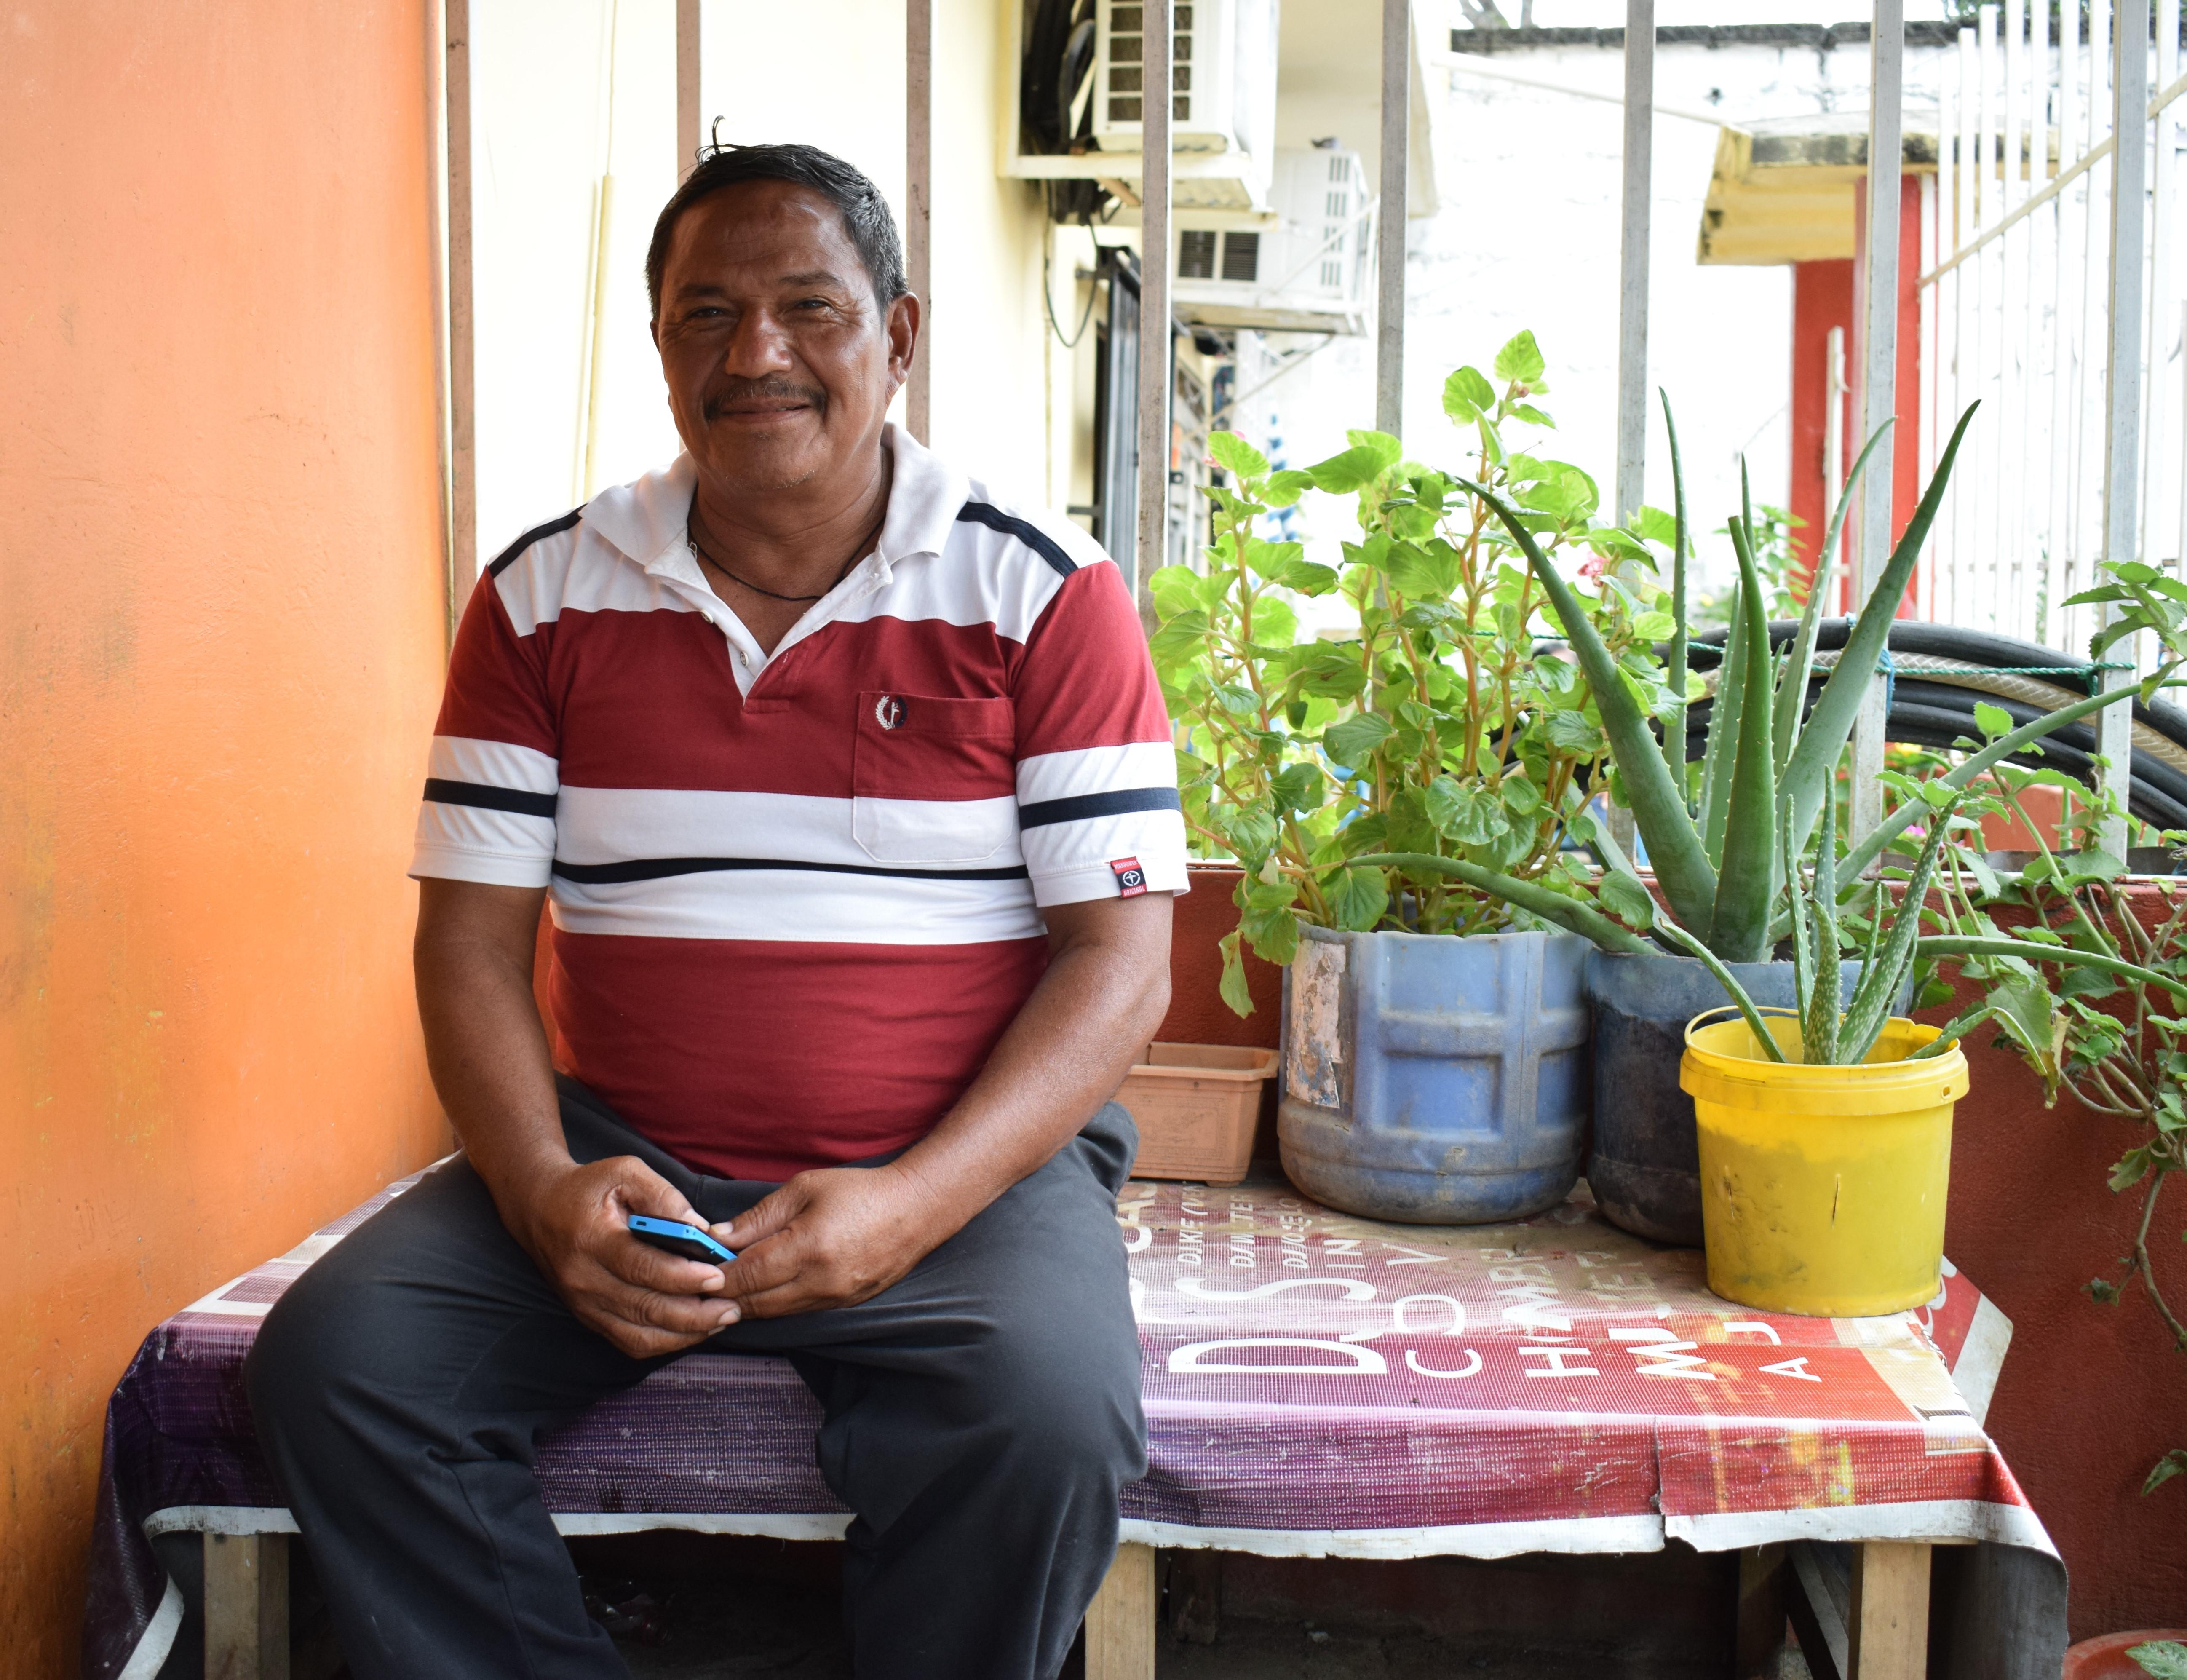 Melambo y sus historias